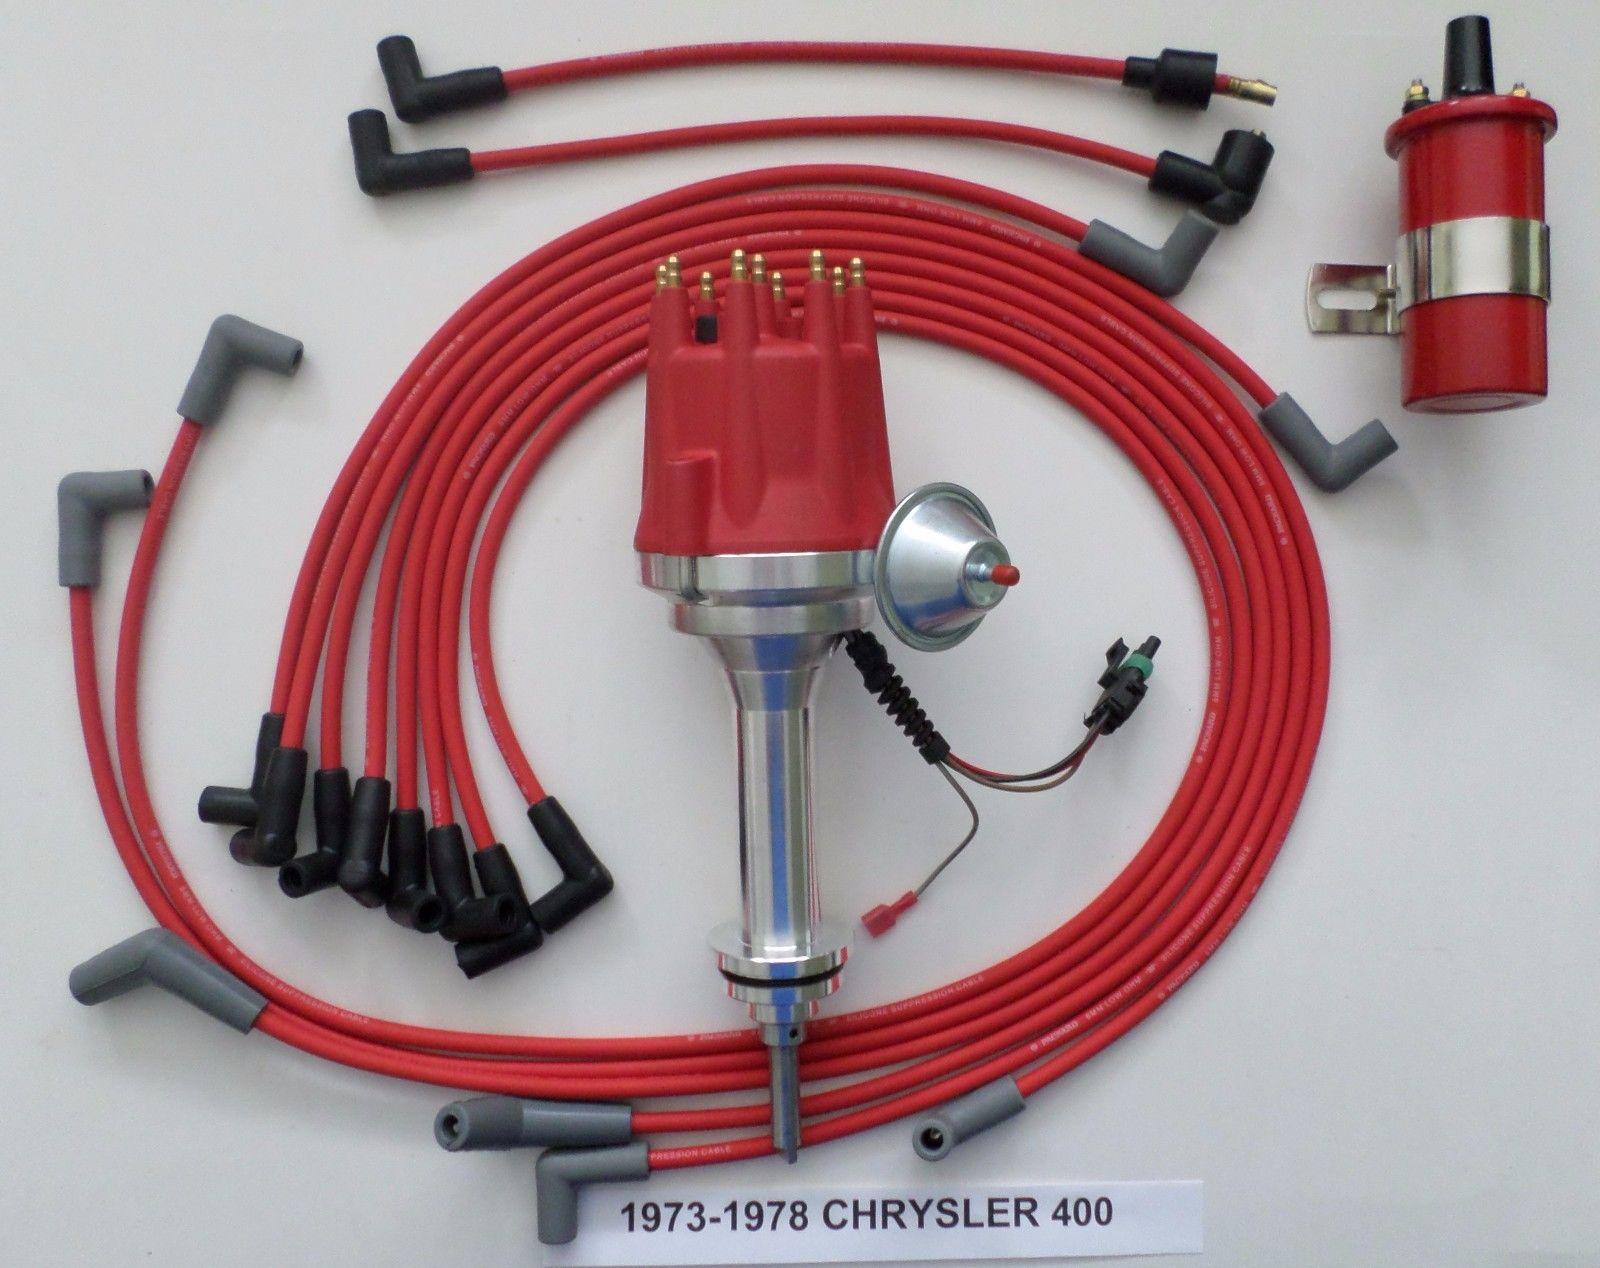 PLYMOUTH 440 73-78 BLACK Small Female HEI Distributor 45K Coil+Spark Plug Wires